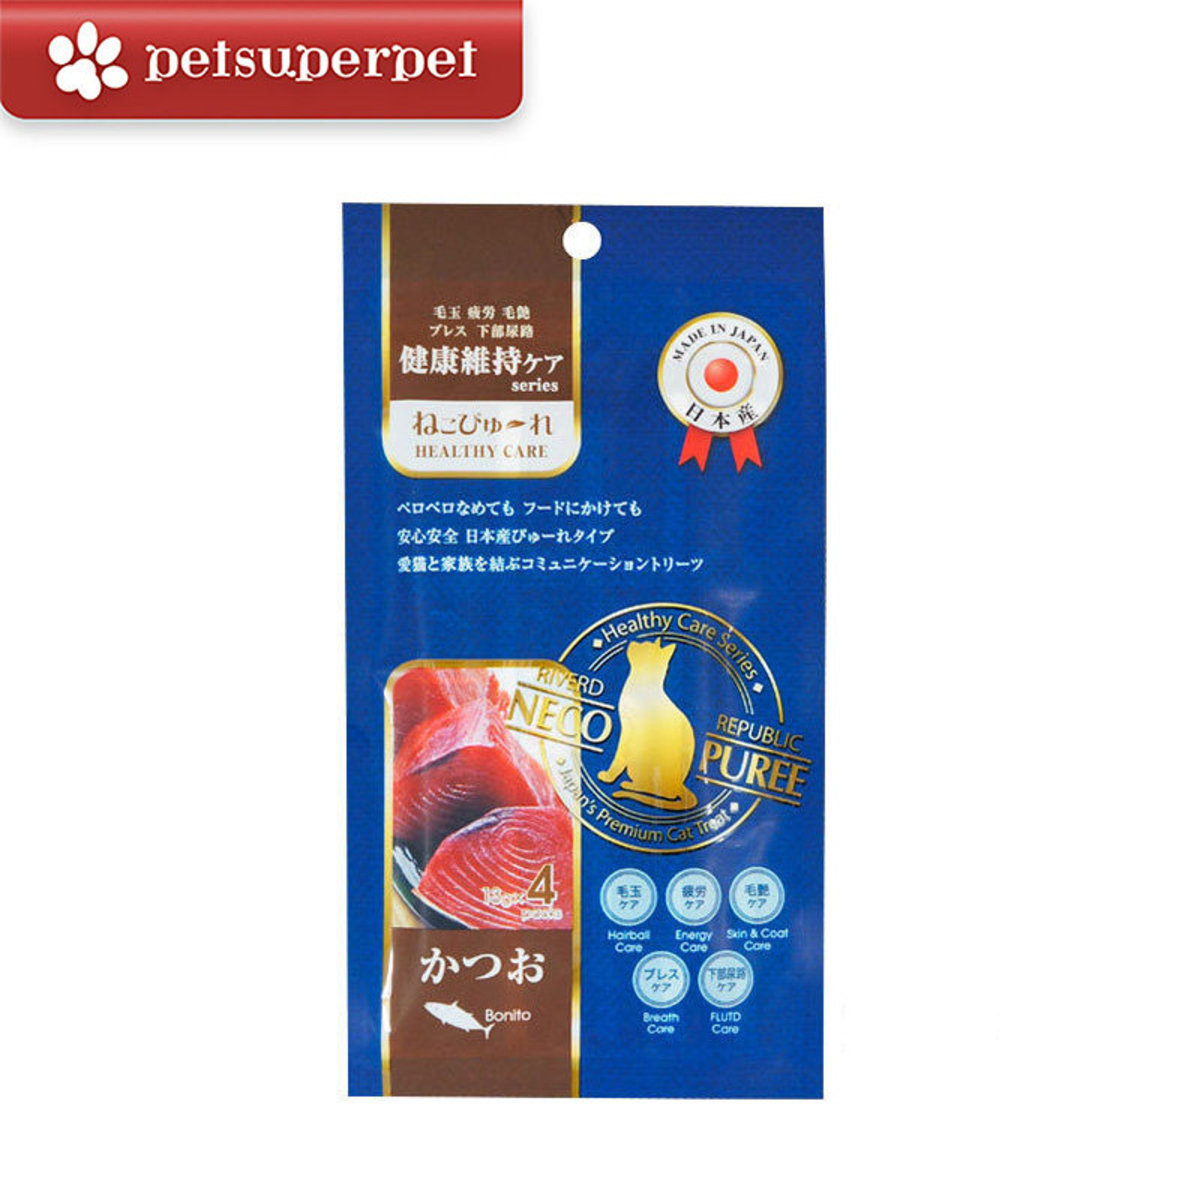 Health Care Pure Series (Bonito) - 13g x 4packs